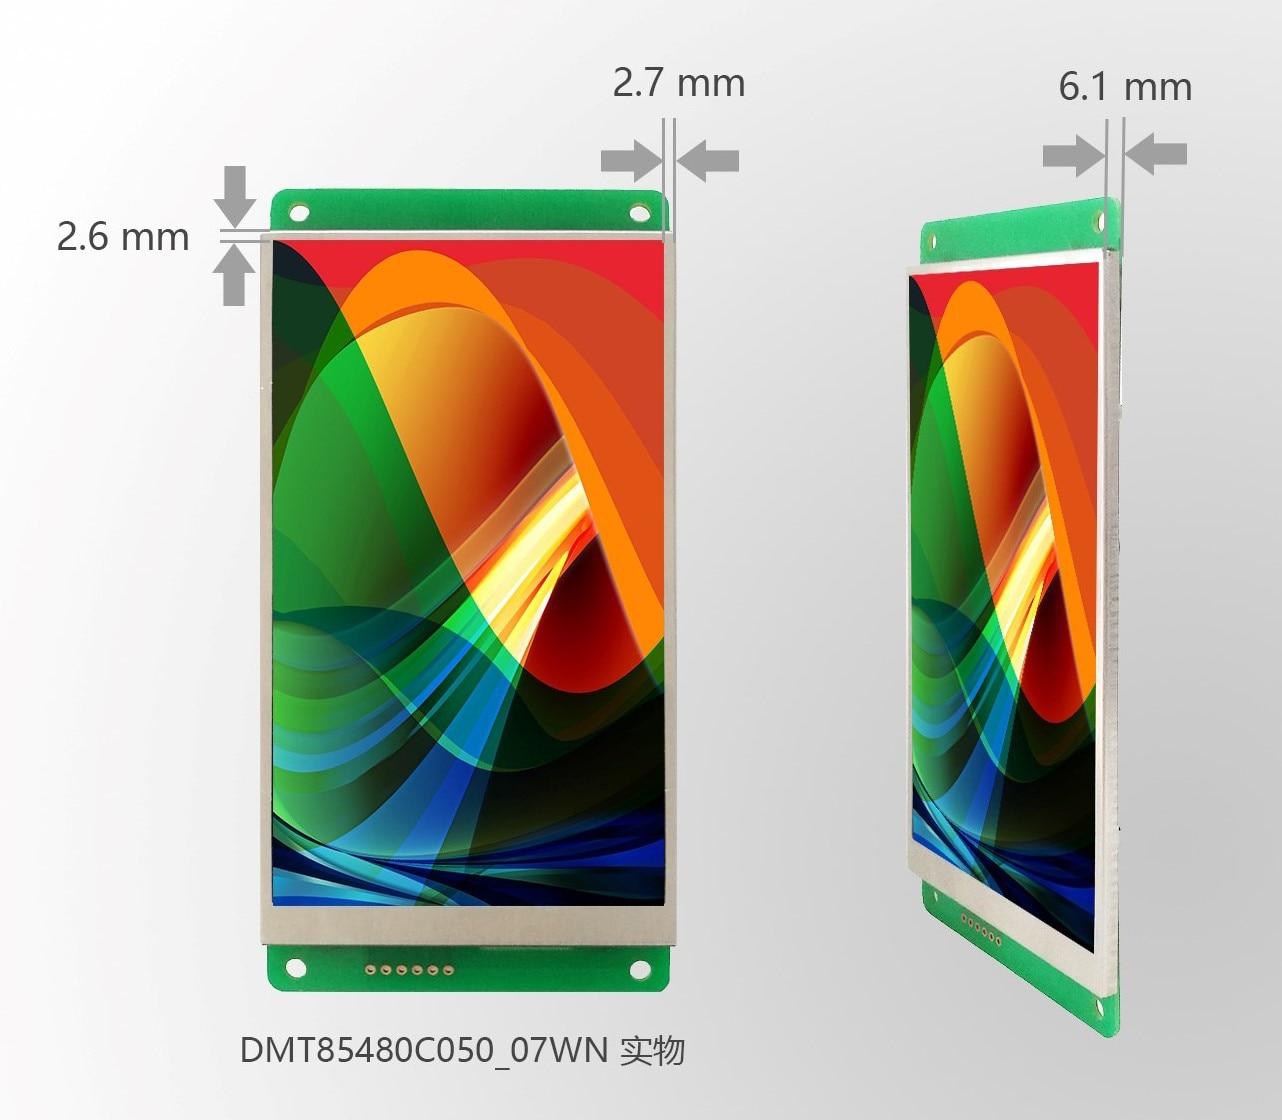 DMT85480C050_07W DMT85480C050_07WN/T DWIN 5 pulgadas serie pantalla dgus II marco estrecho IPS pantalla capacitiva de la pantalla táctil